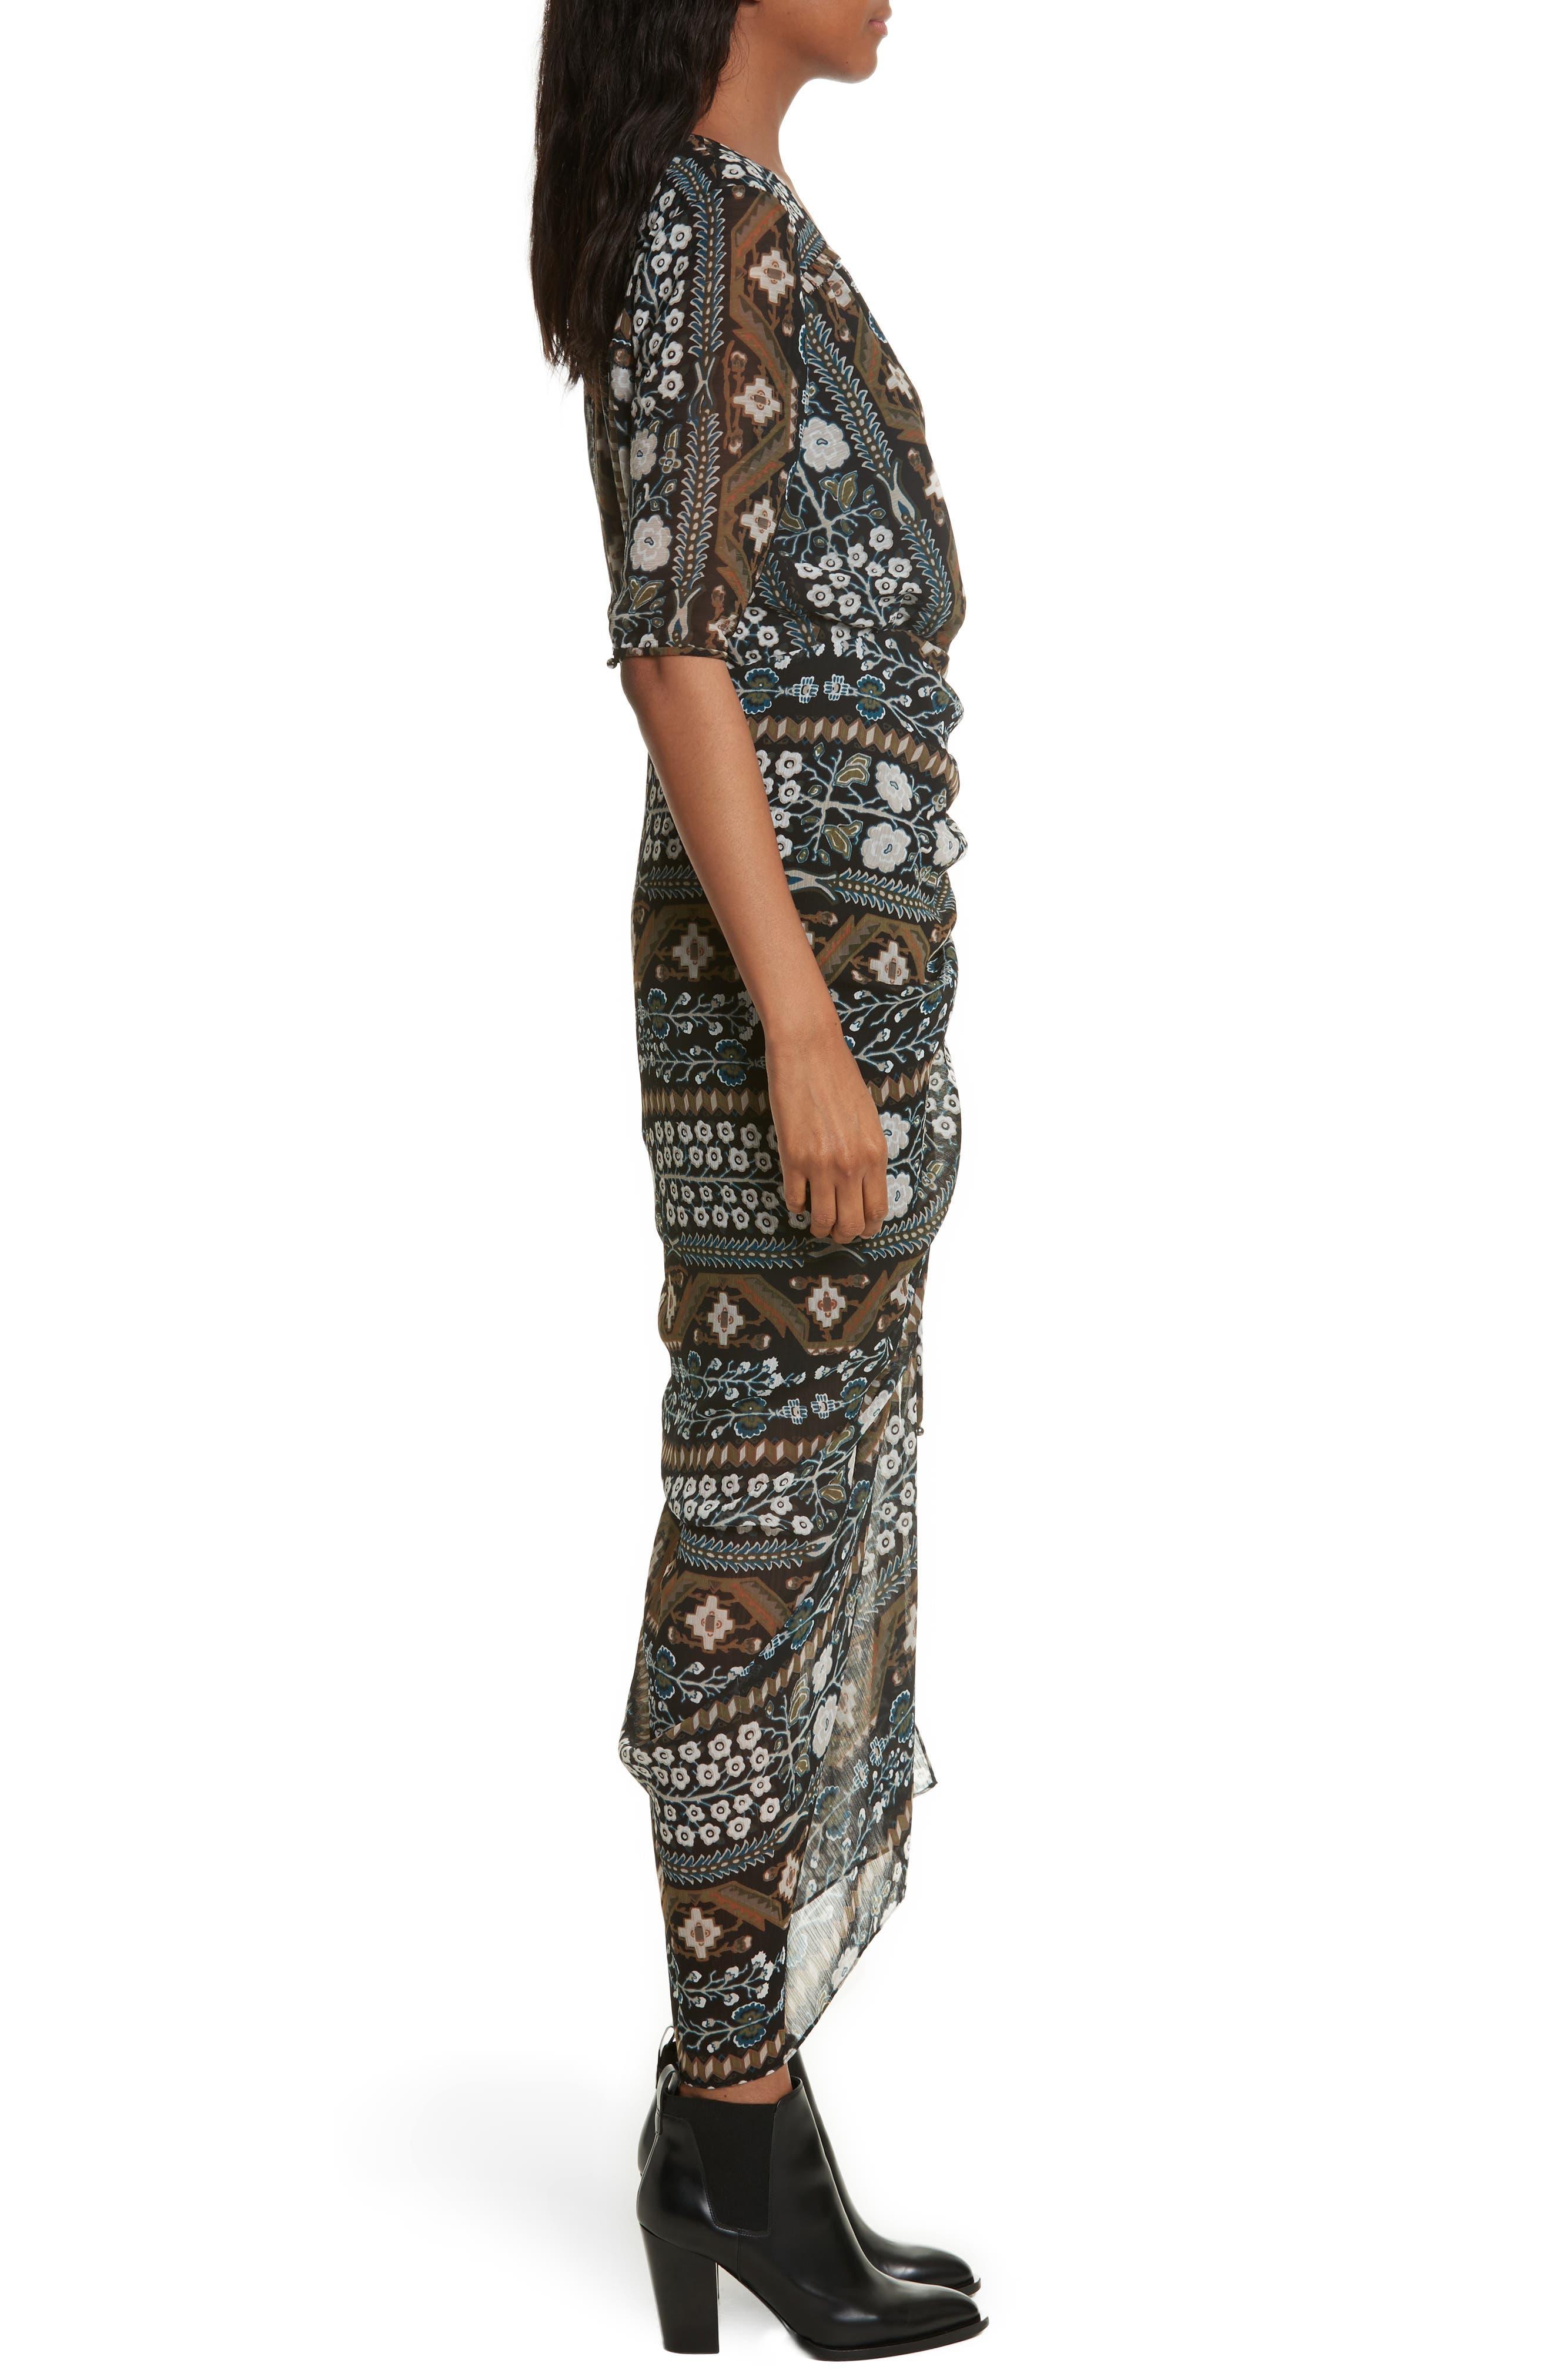 Perla Ruched Midi Dress,                             Alternate thumbnail 3, color,                             Army/ Black Multi